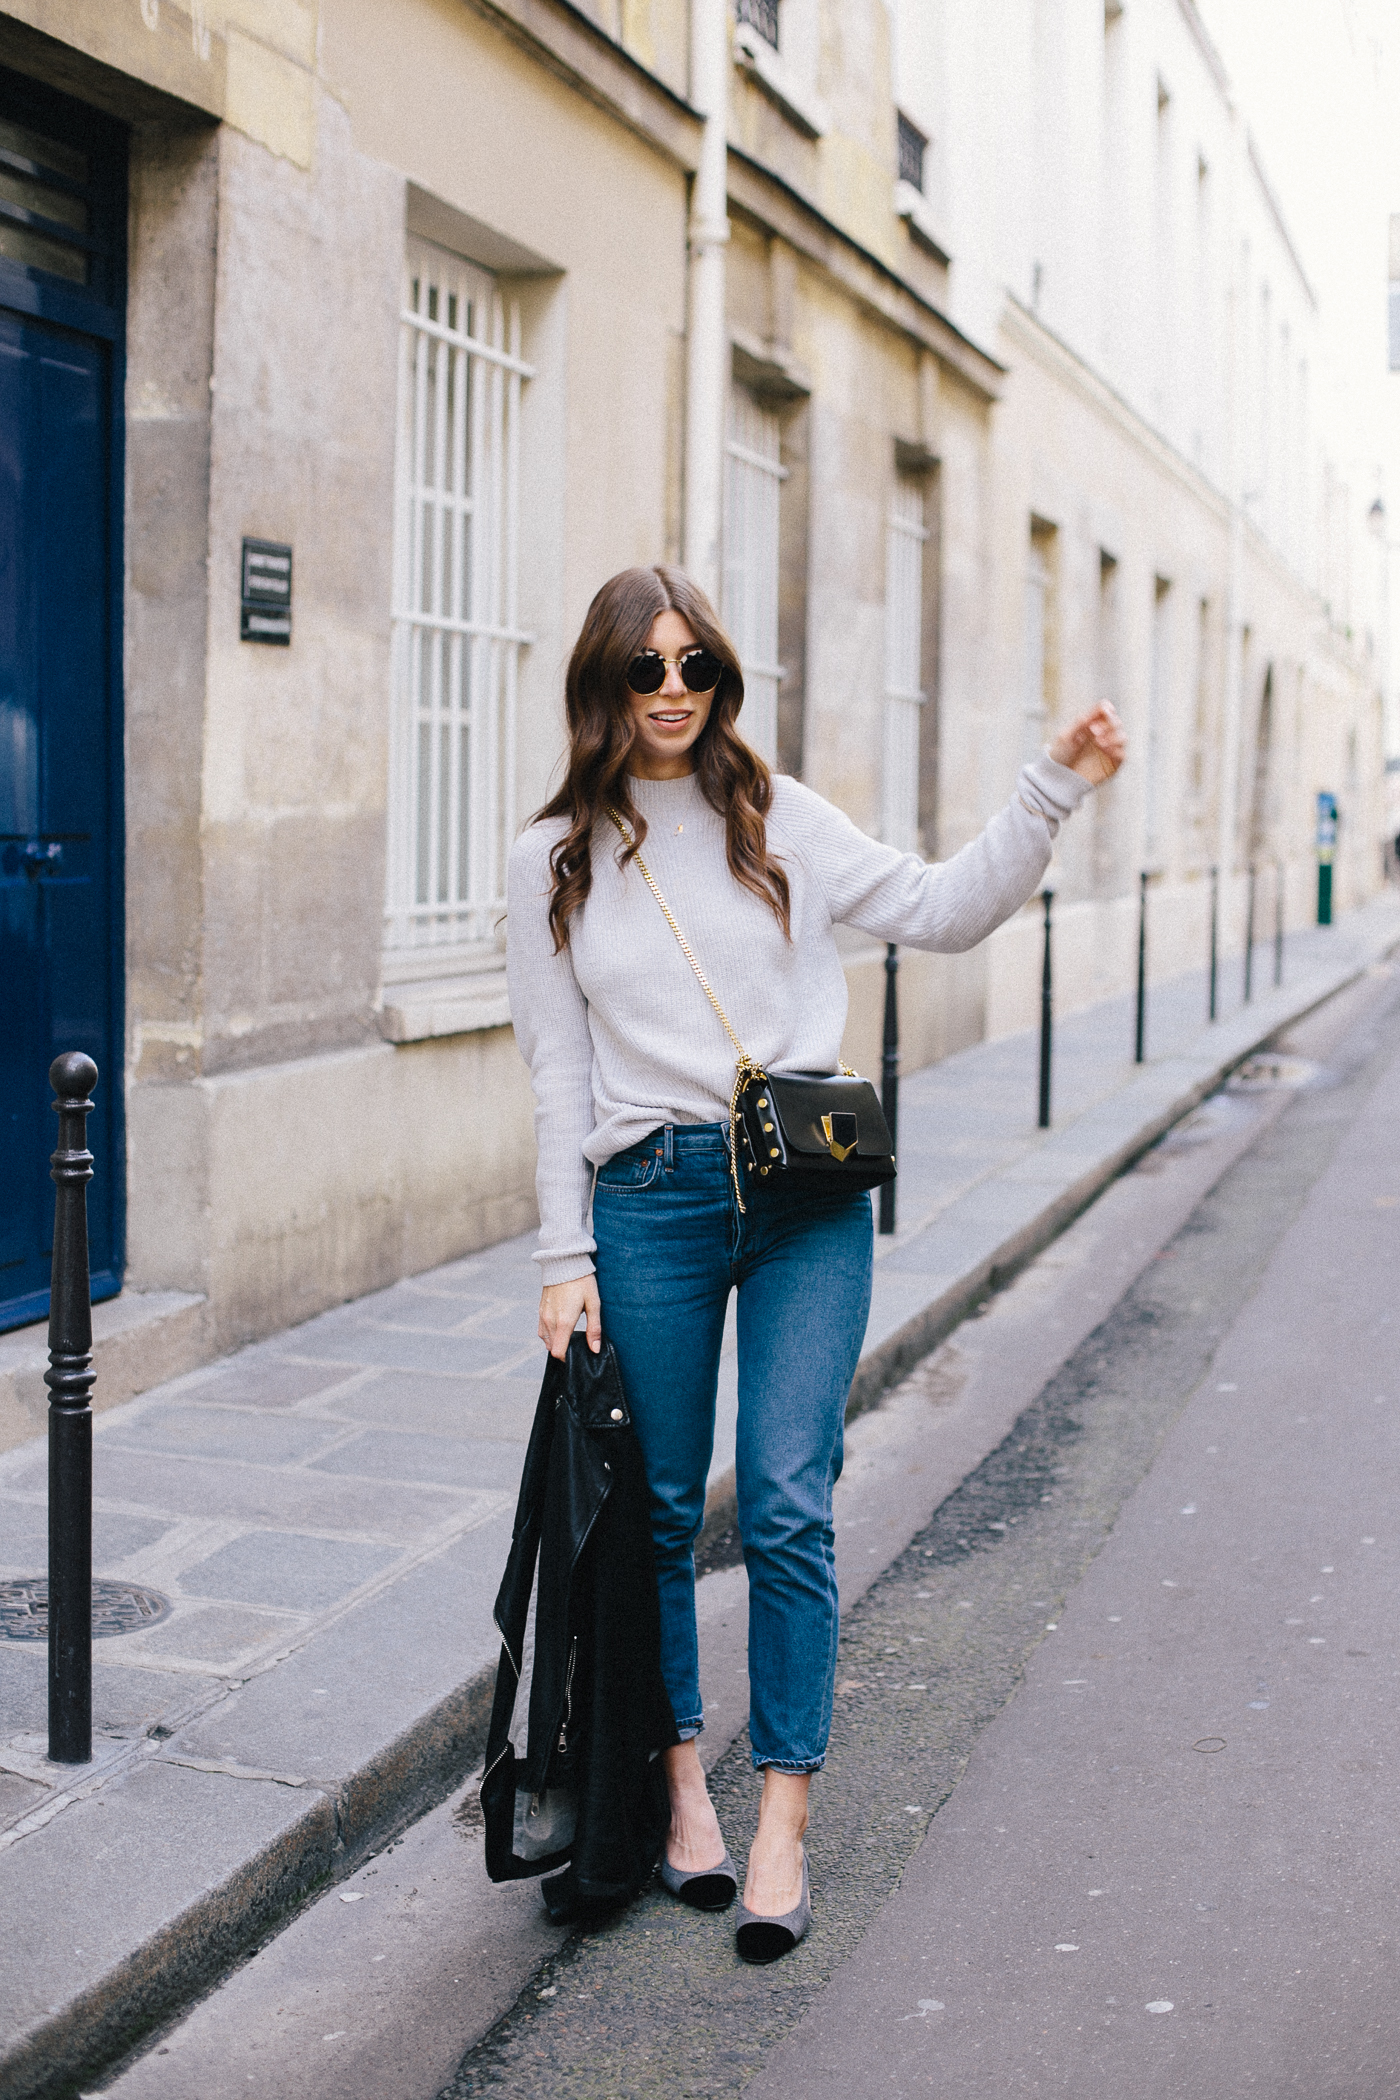 OUTFIT: Chanel Slingback, Jimmy Choo Petite Lockett, Mom Jeans | Bikinis & Passports